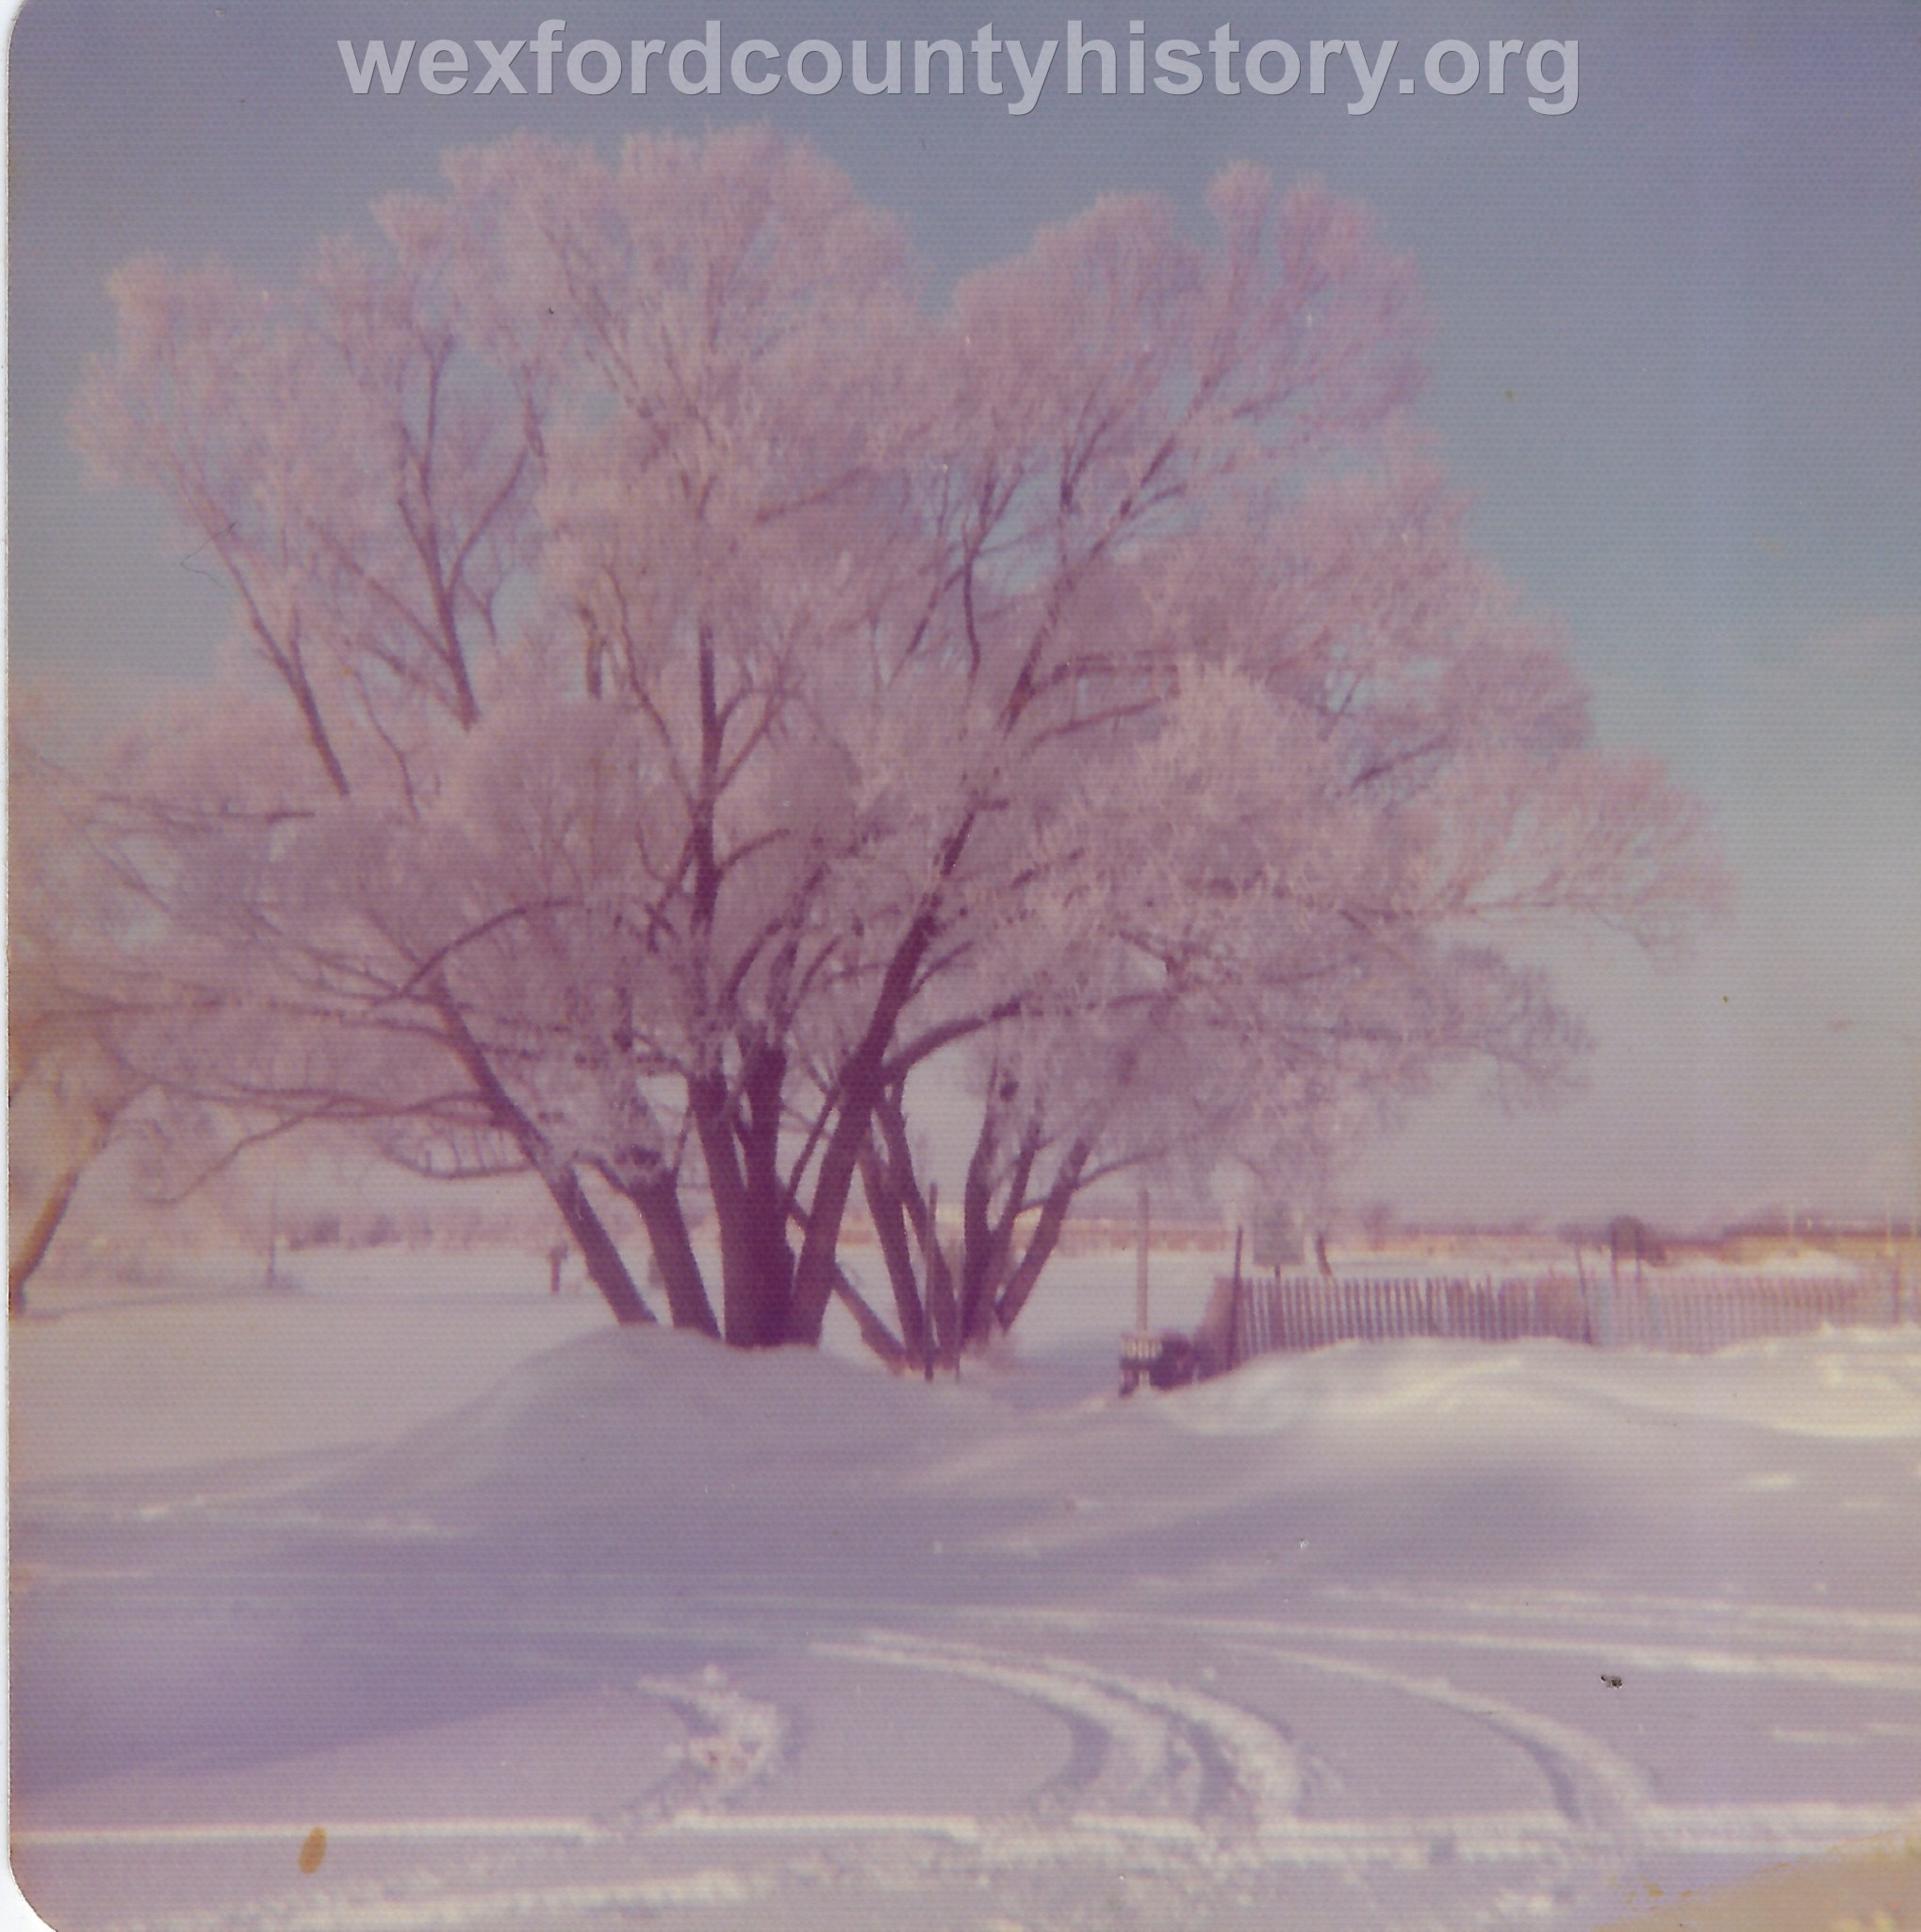 Cadillac-Weather-Winter-Scene-11